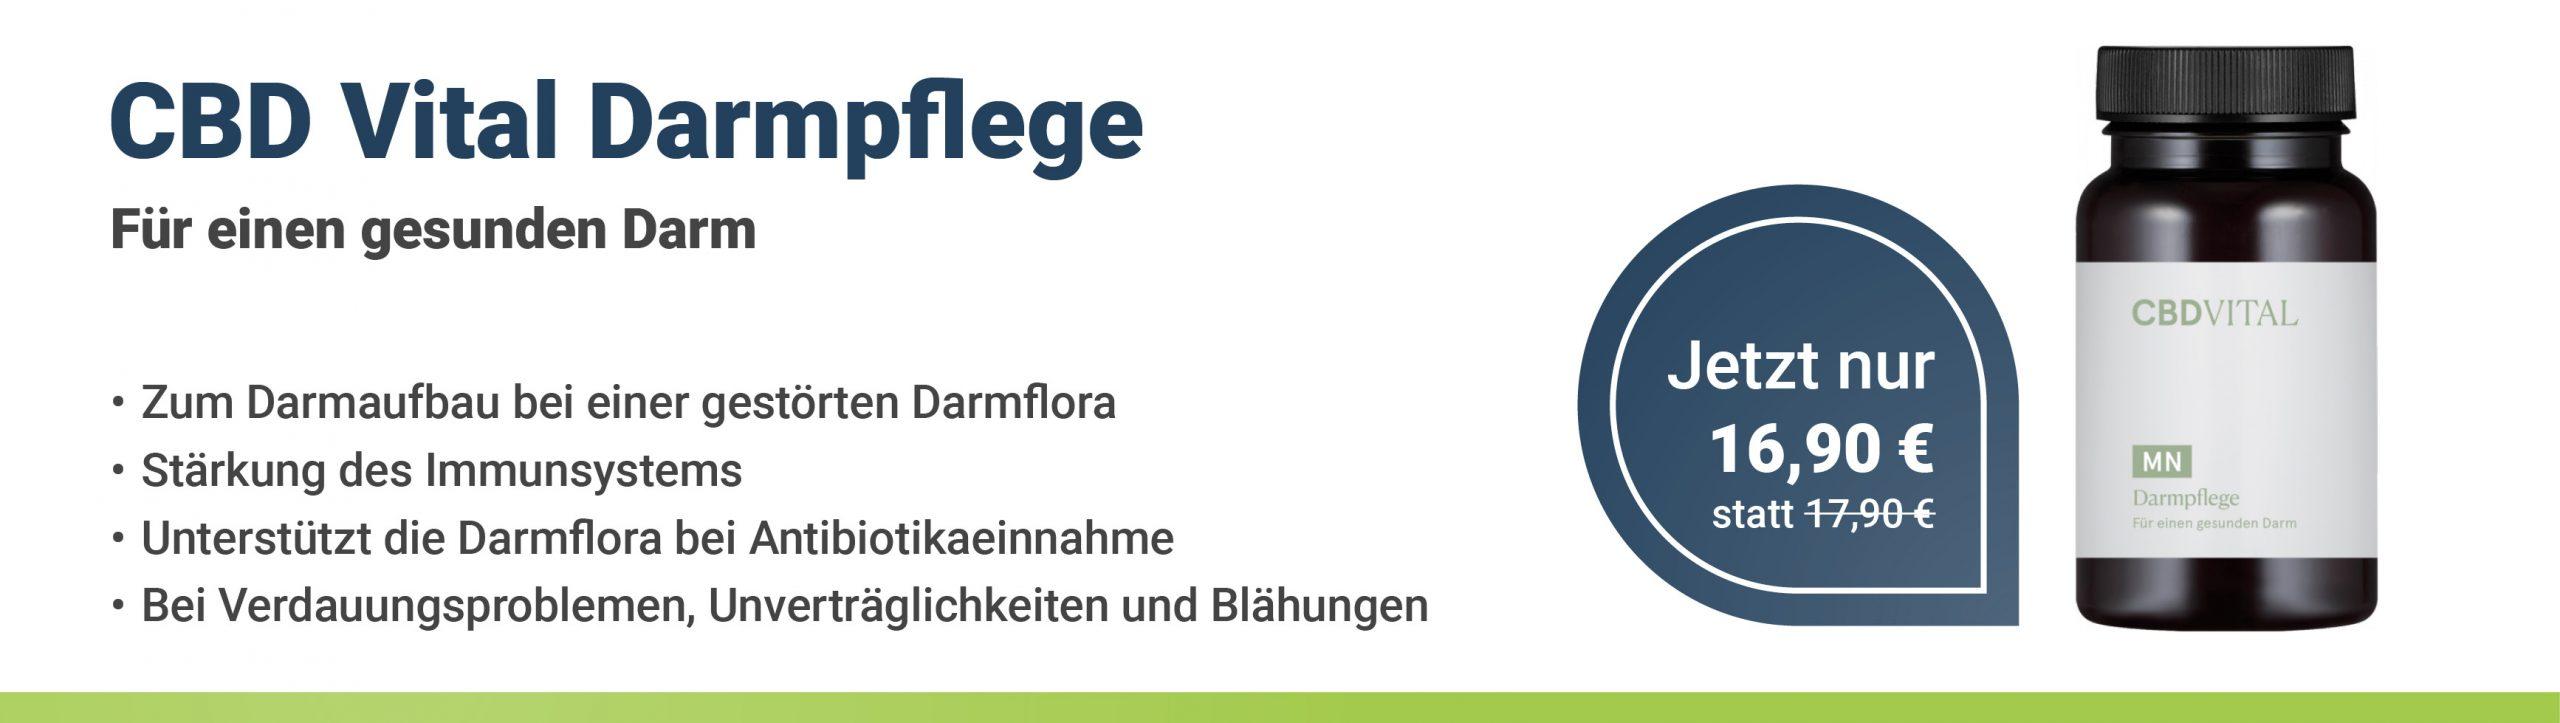 https://www.health-rise.de/wp-content/uploads/2021/09/Darmpflege_mobil.jpg